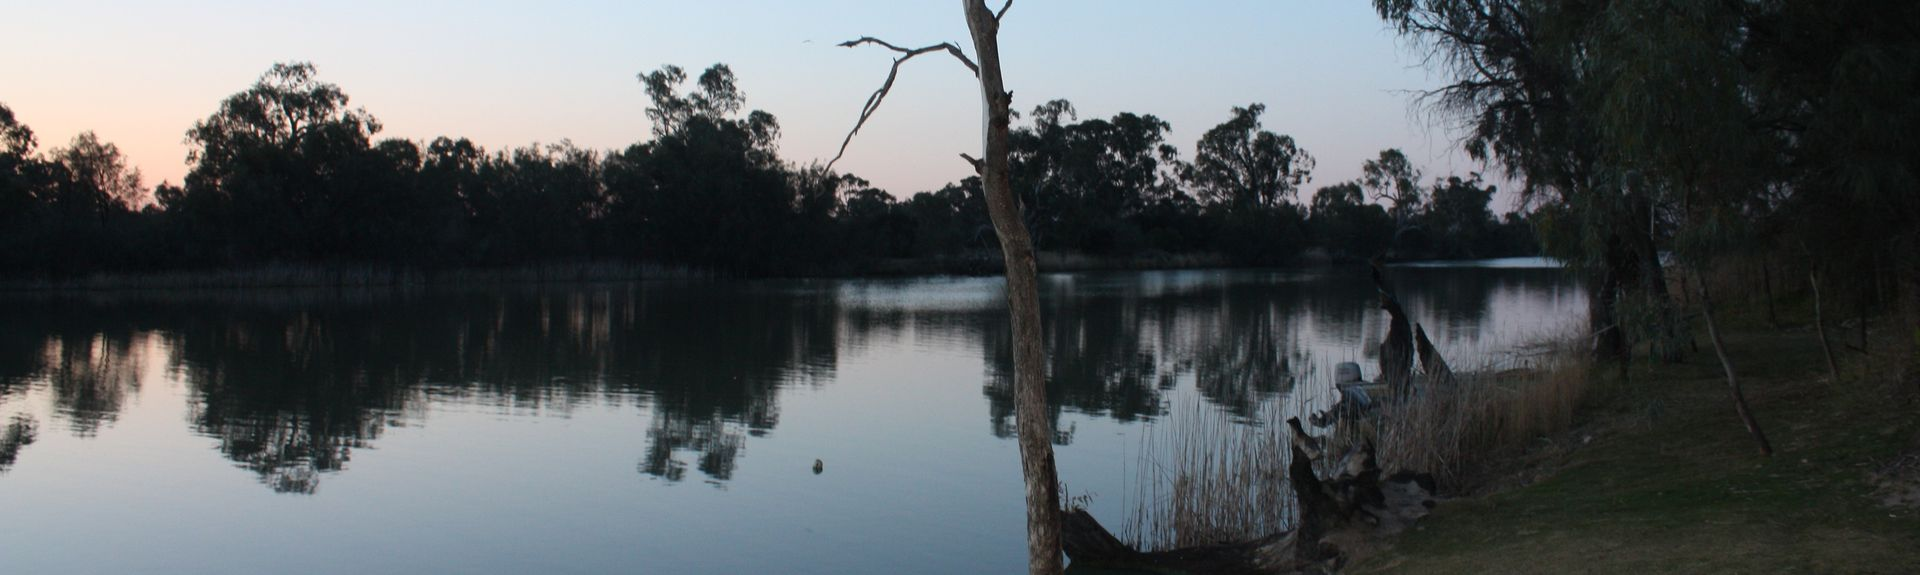 Riverland, Zuid-Australië, Australië